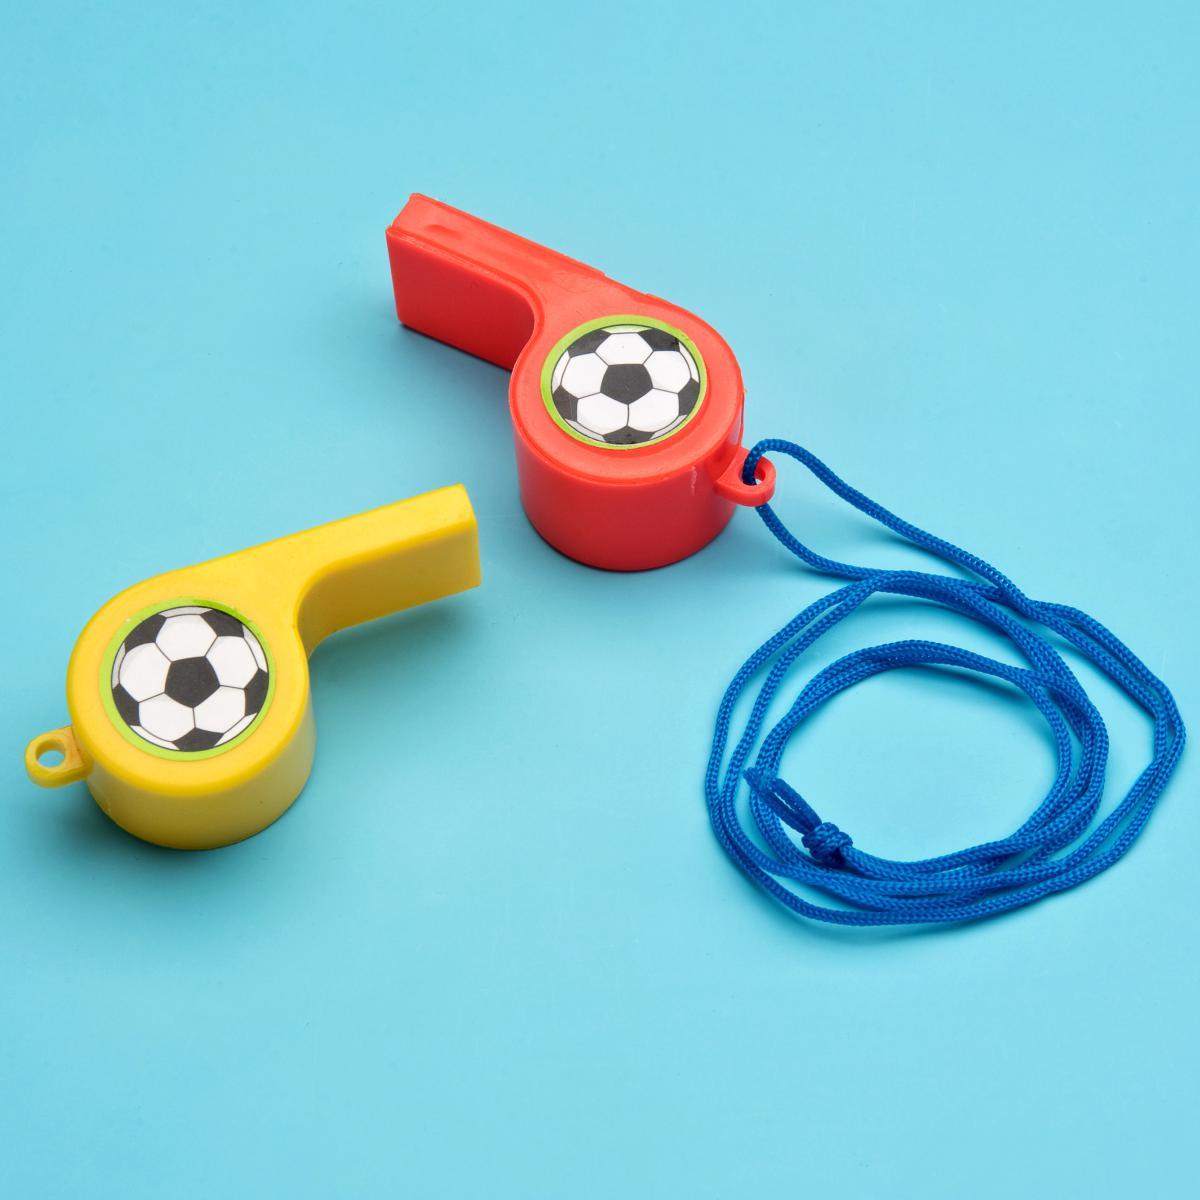 Schiedsrichterbedarf